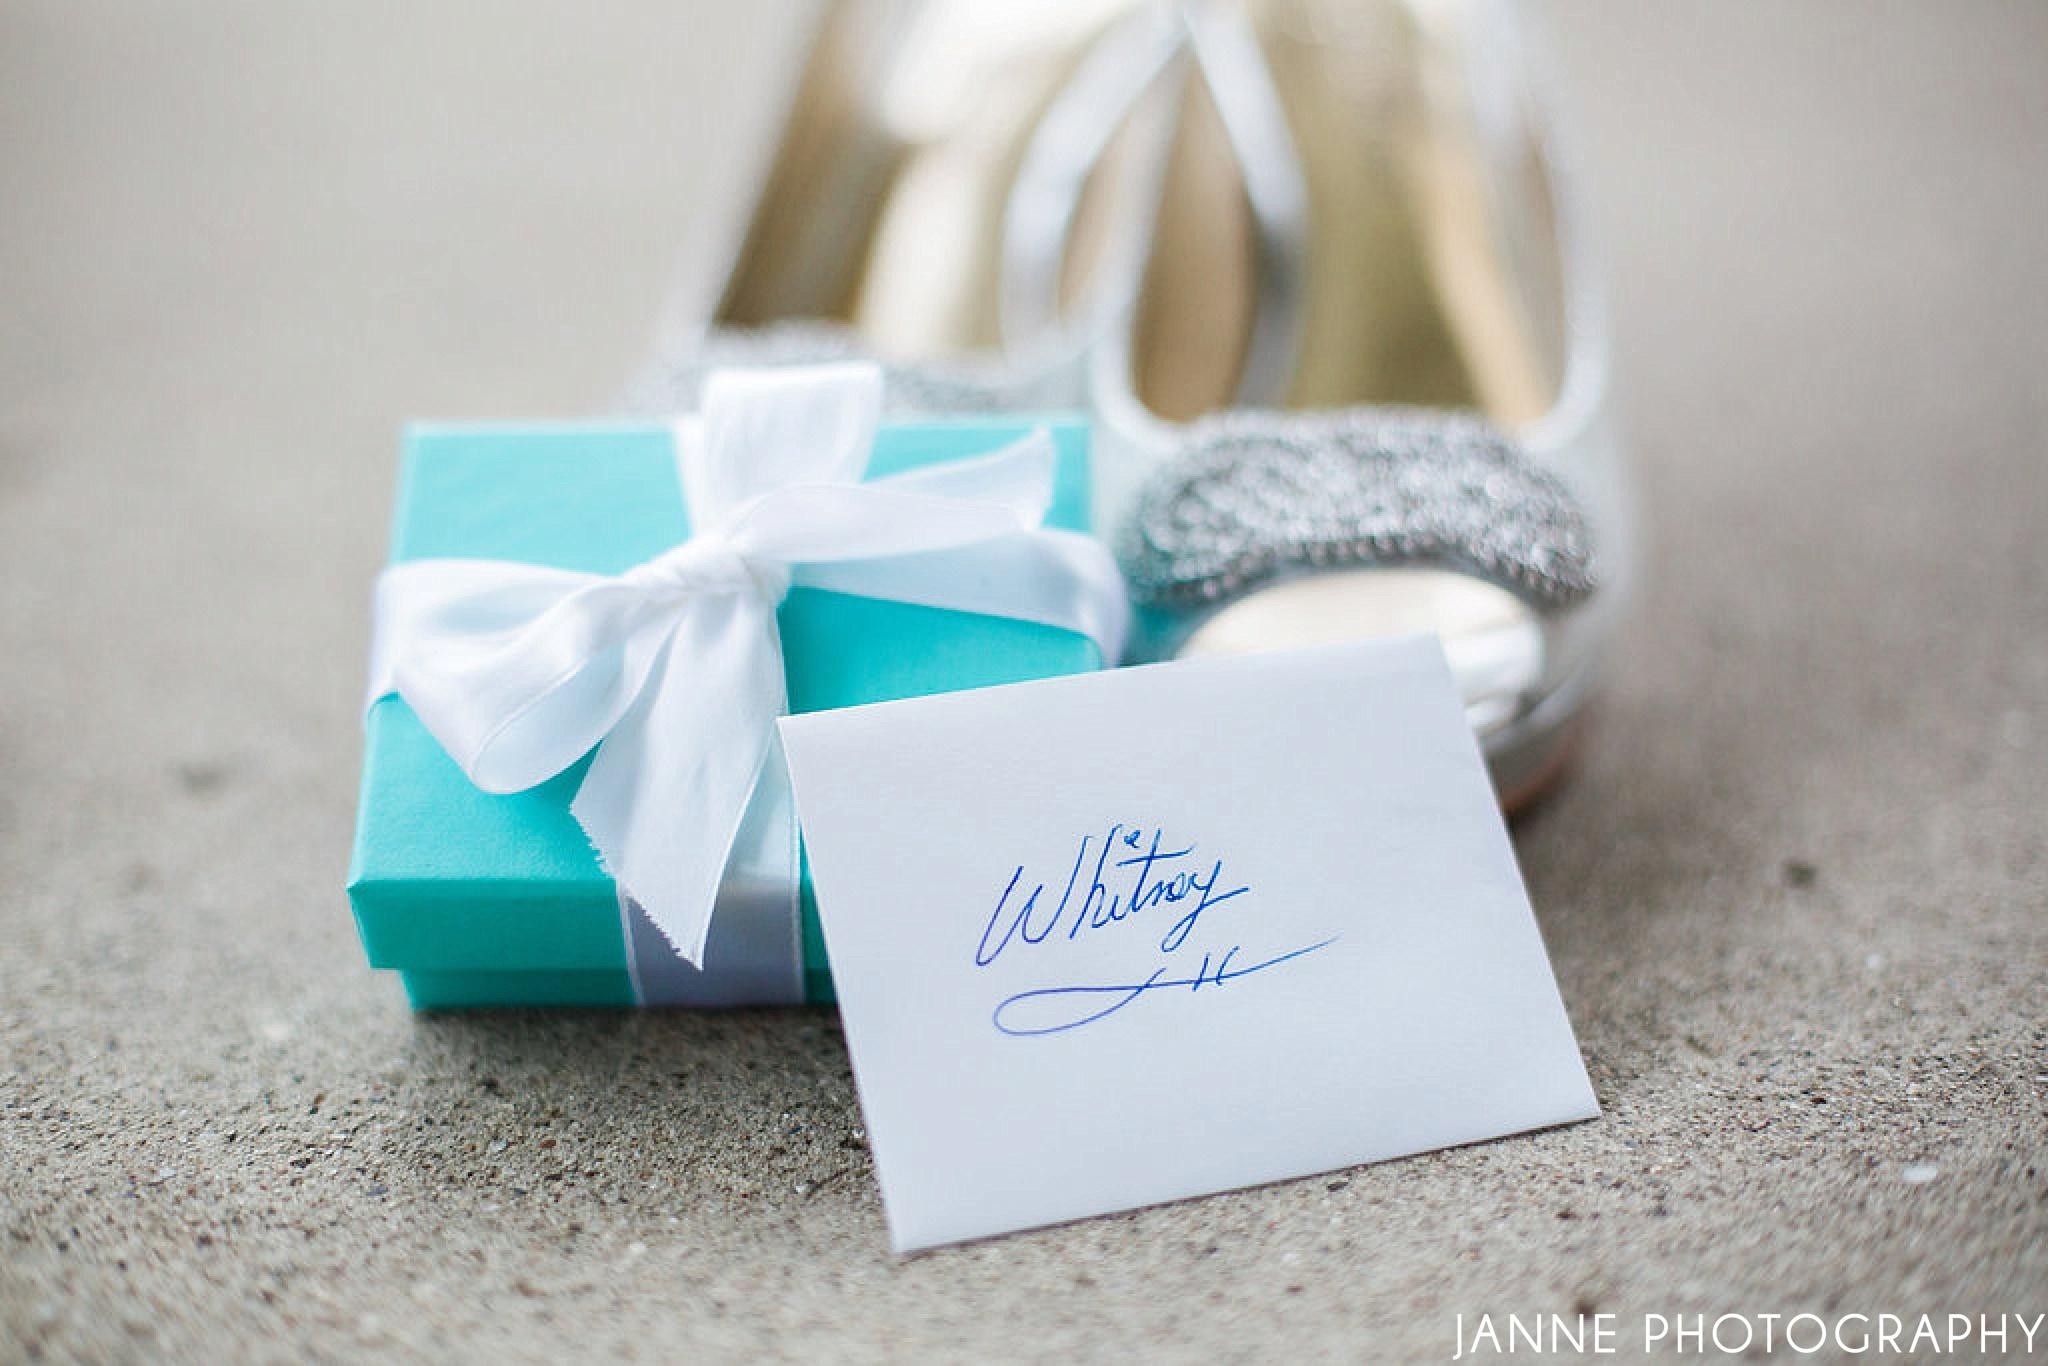 Cincinnati_Wedding_Receptions_Fairfield_Tiffany_Wedding_Gift